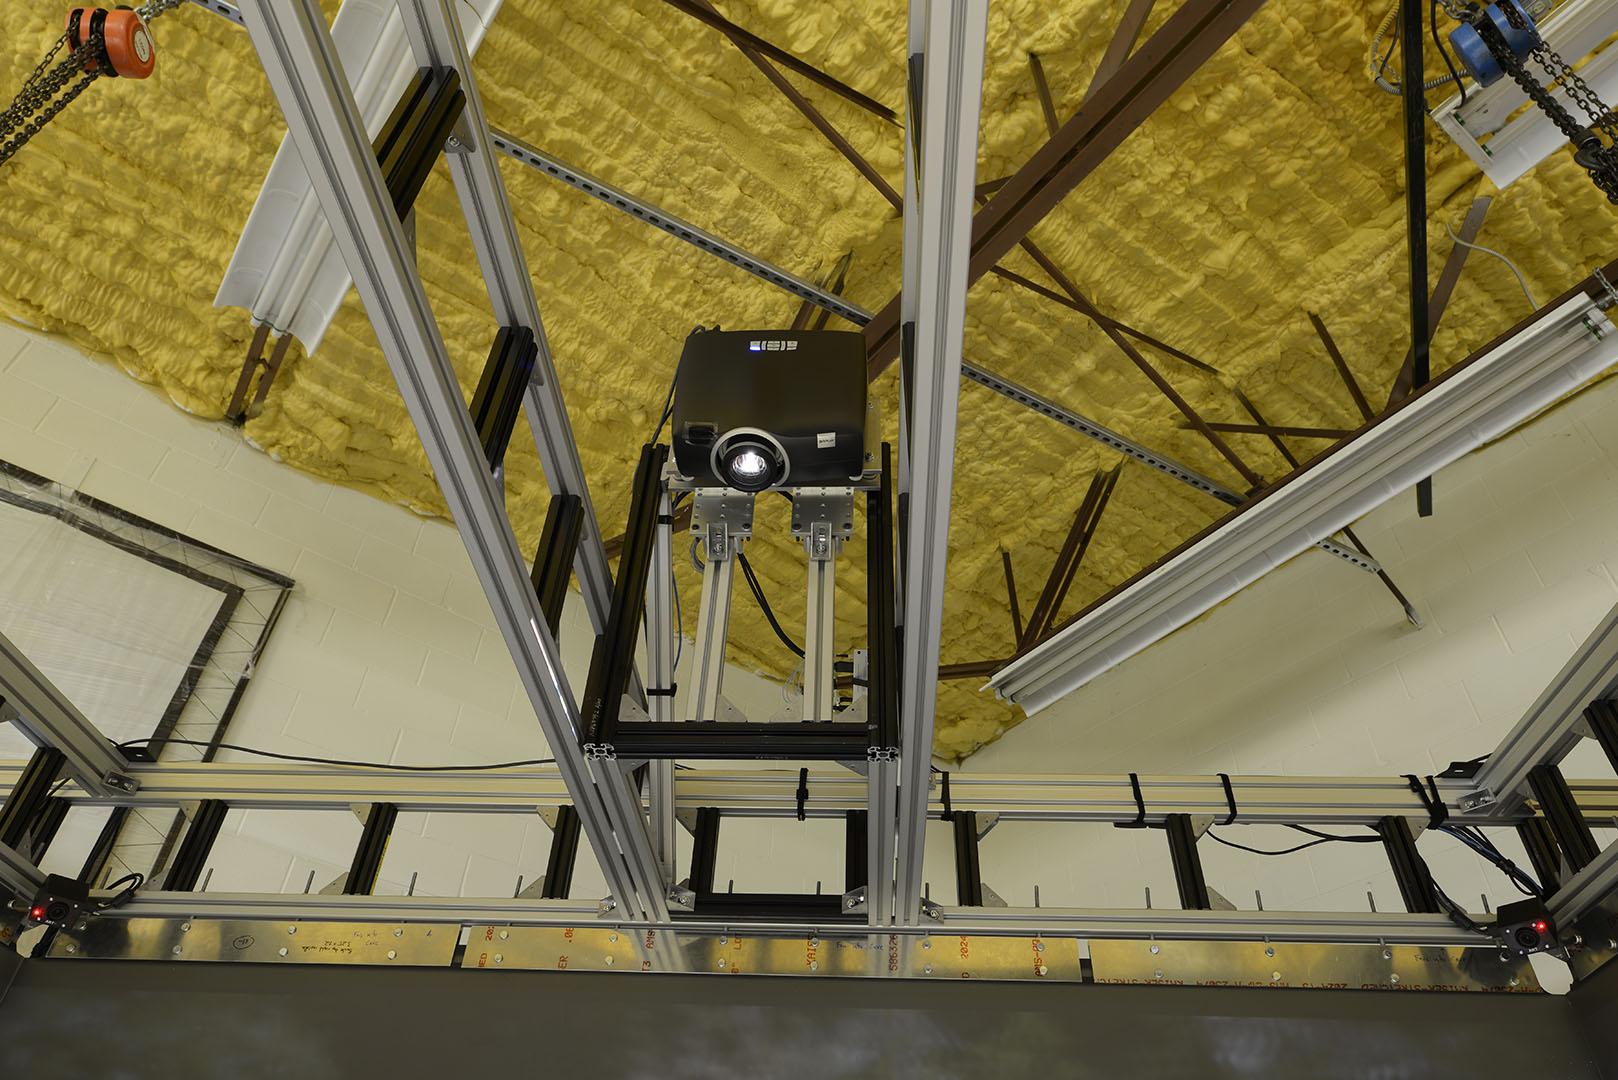 ceiling projector custom fabrication IGI cave 3D technology